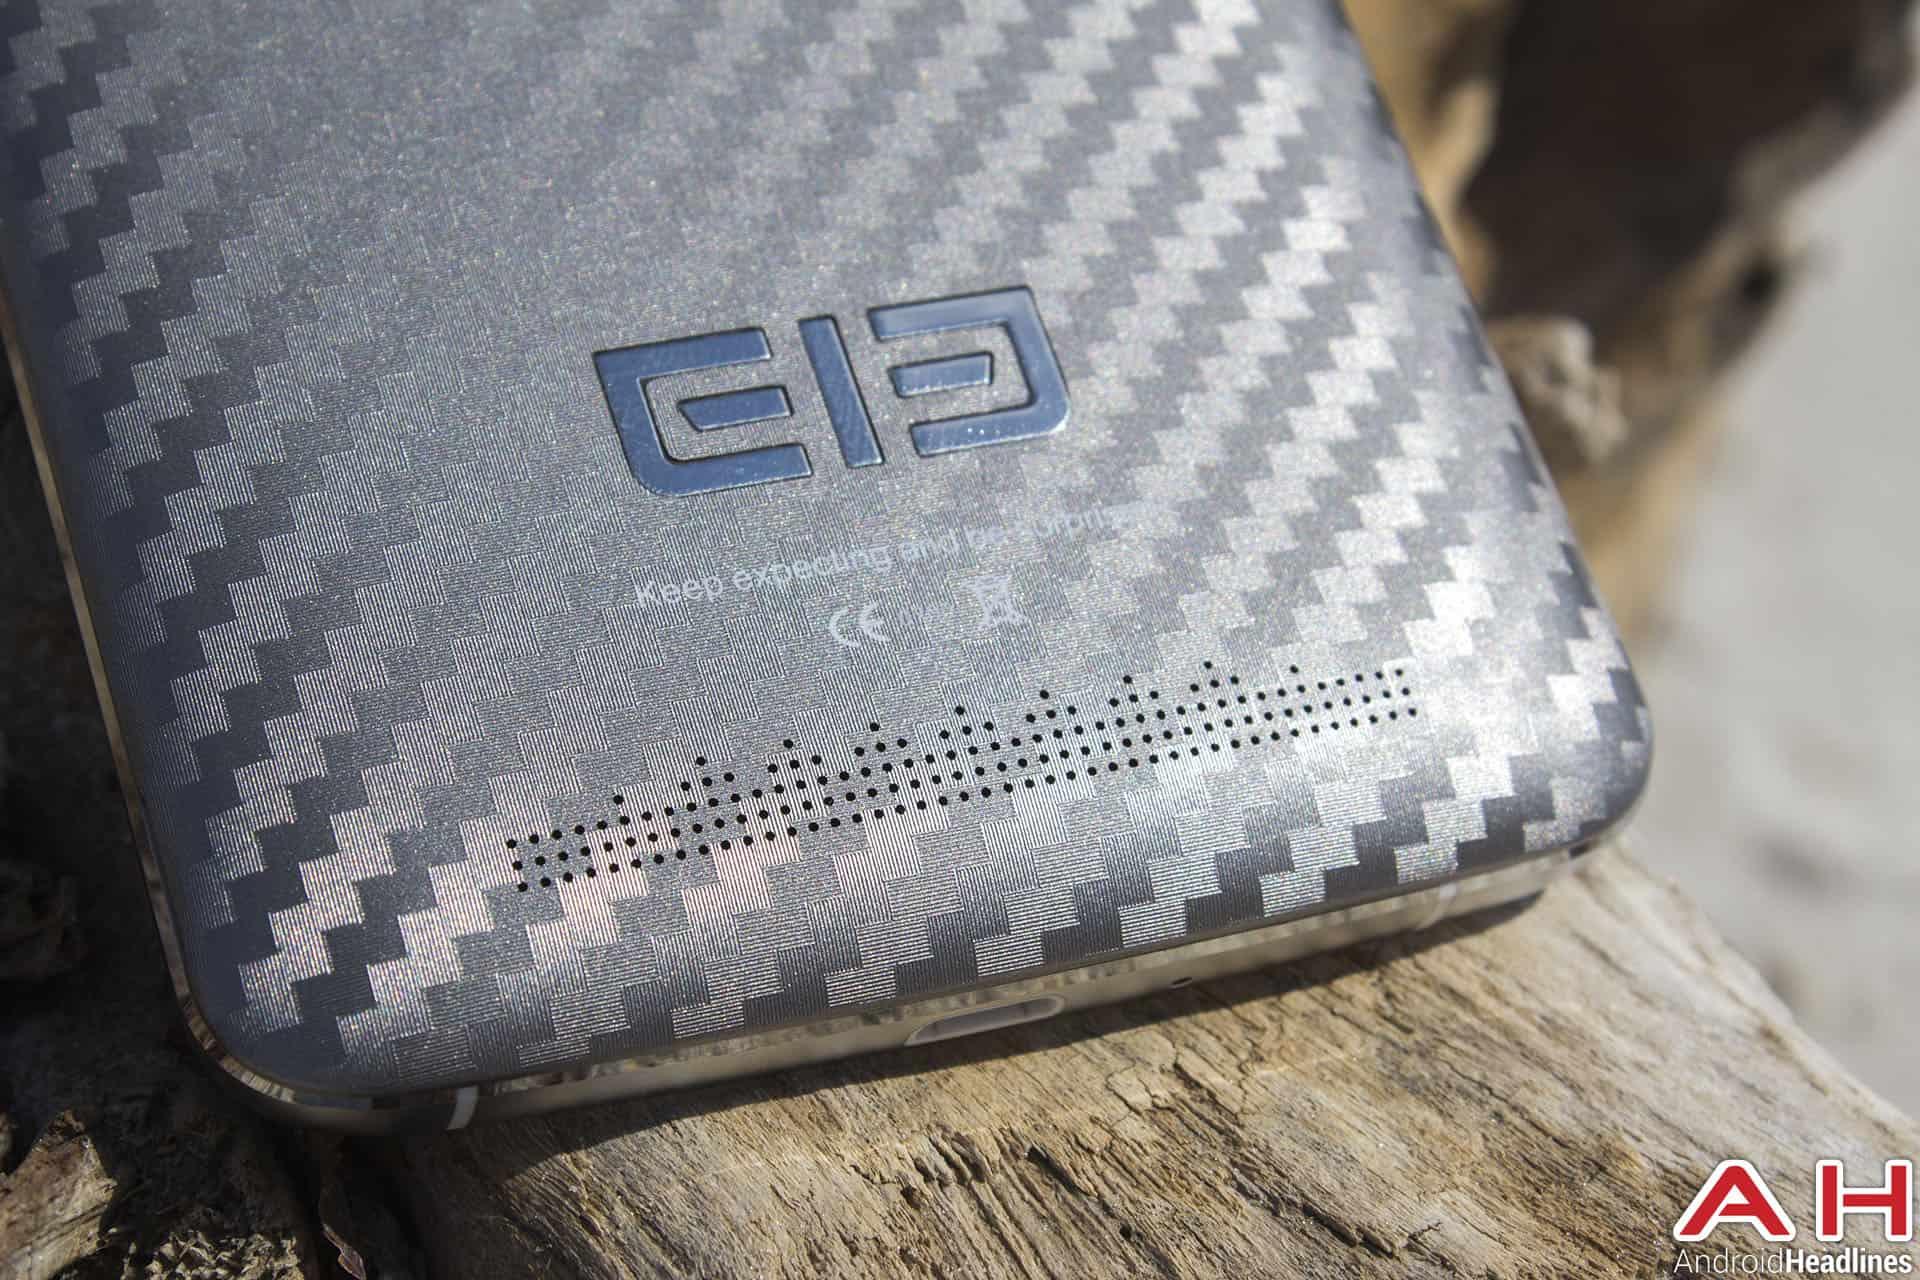 elephone-p8000-review-AH-logo-1